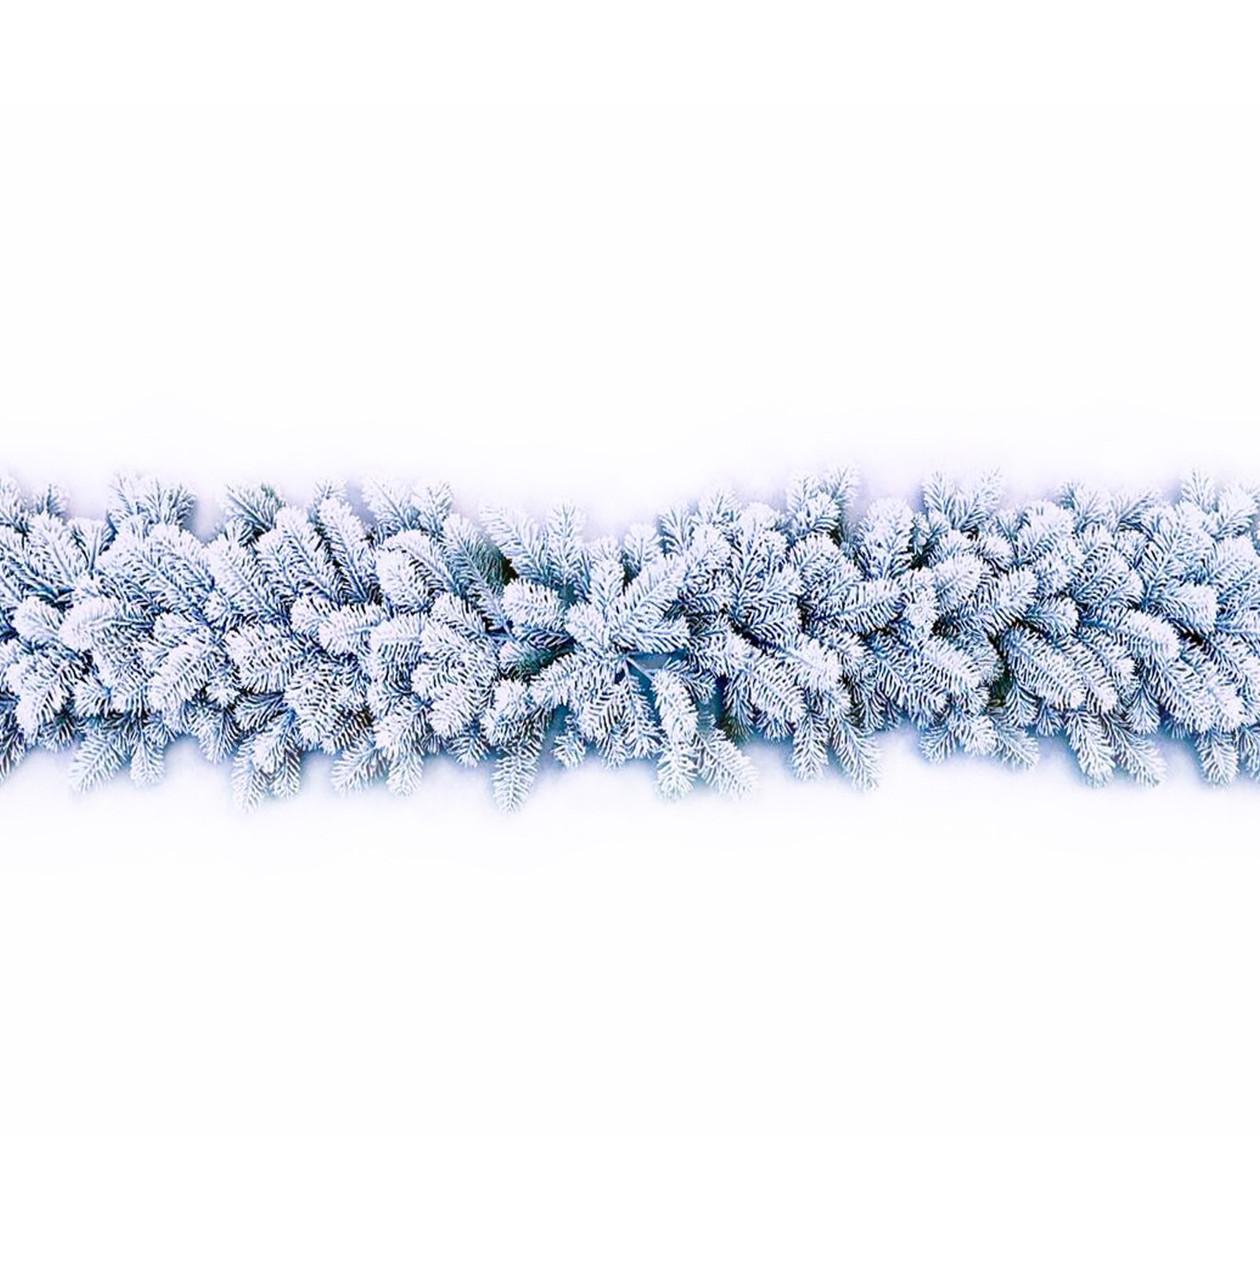 Гирлянда хвойная литая заснеженная 220 см, Ø 30 см